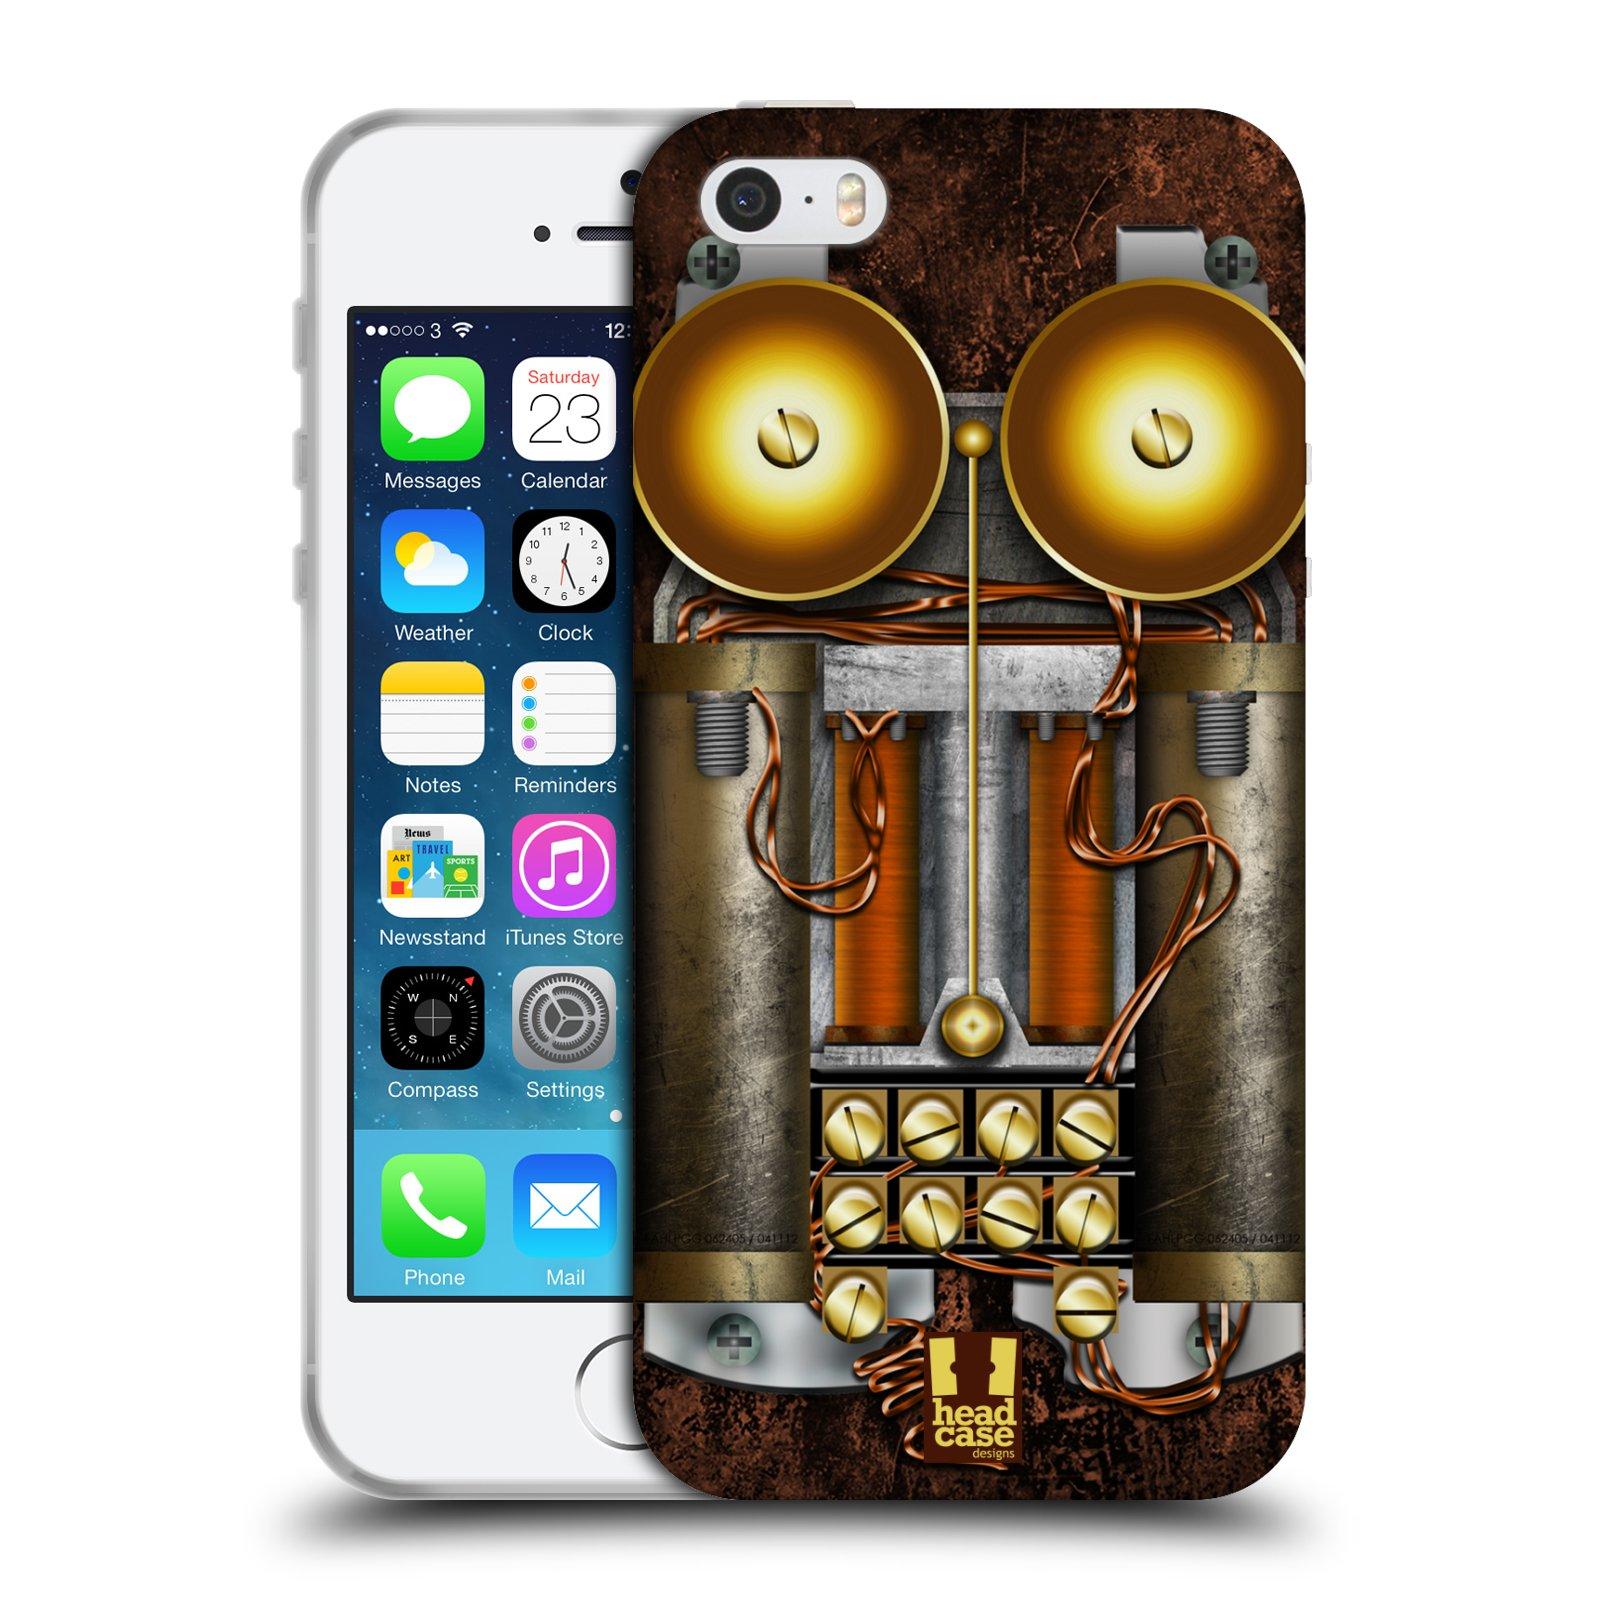 Silikonové pouzdro na mobil Apple iPhone SE, 5 a 5S HEAD CASE STEAMPUNK TELEFON (Silikonový kryt či obal na mobilní telefon Apple iPhone SE, 5 a 5S)